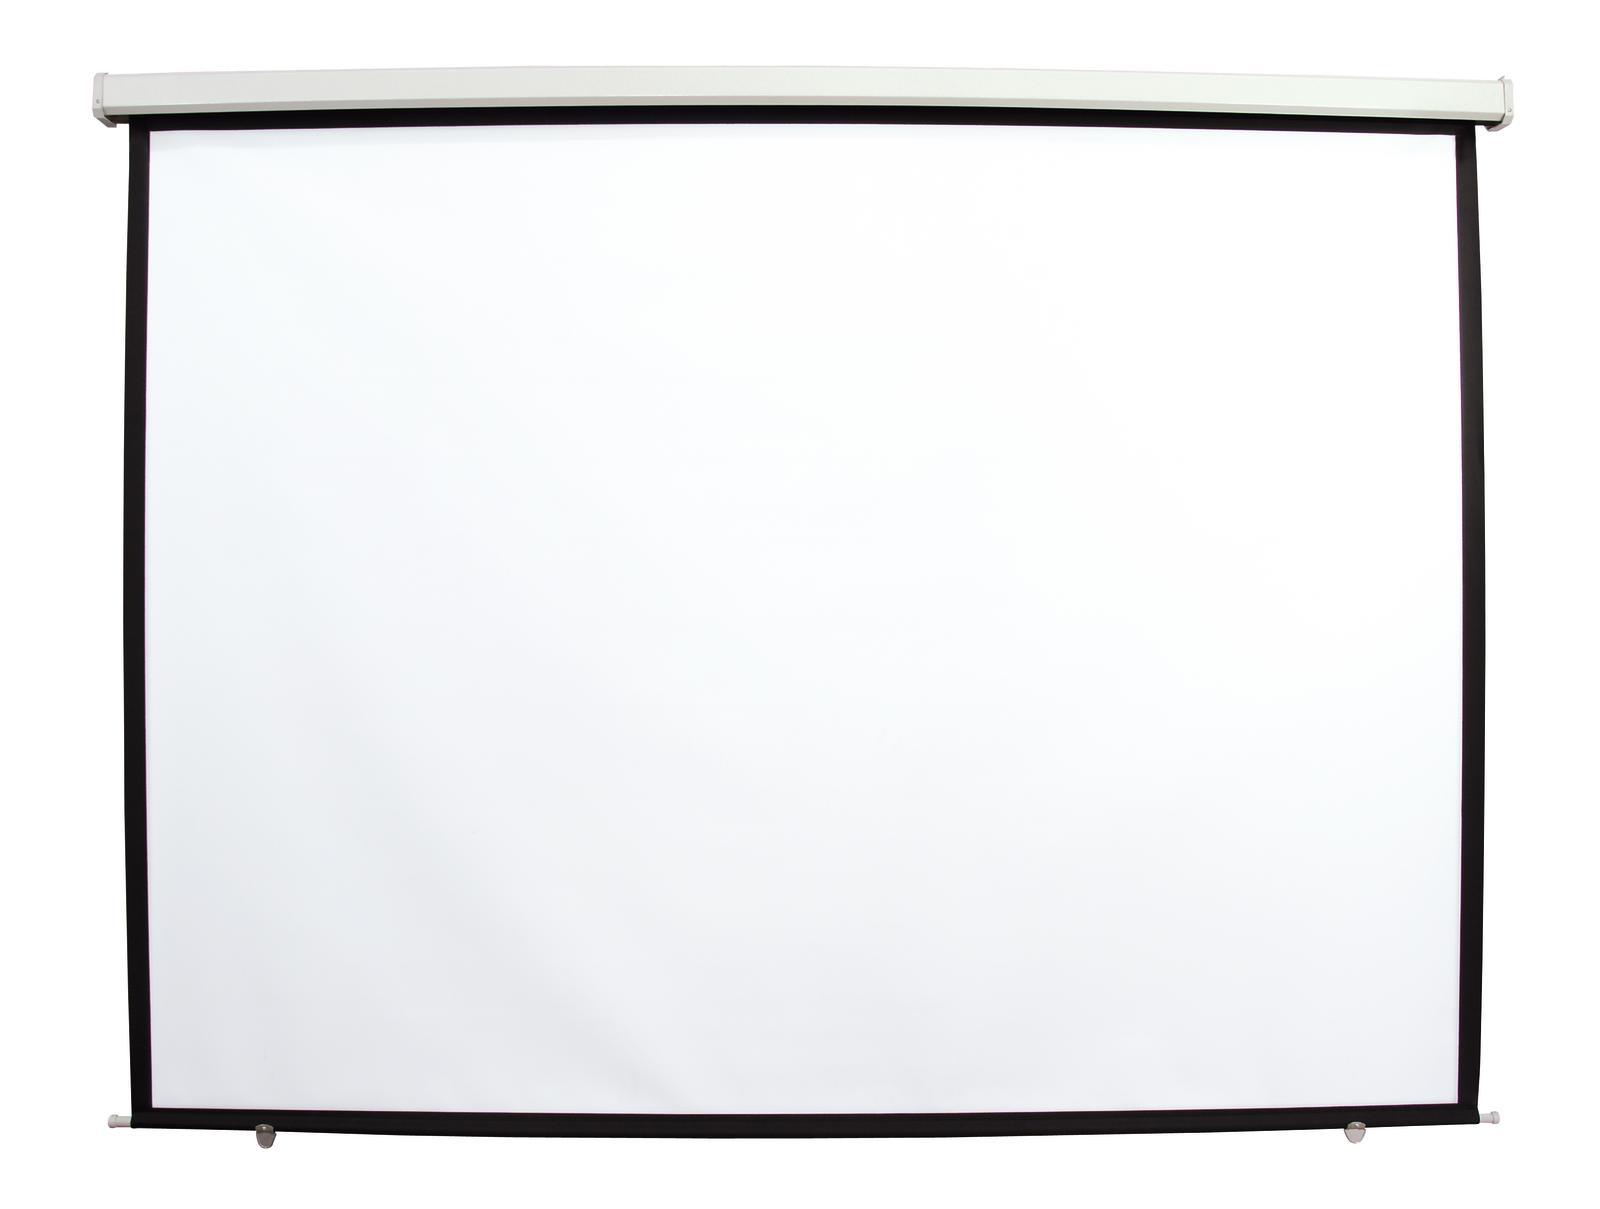 EUROLITE Projektionsleinwand 4:3,240cmx180cm